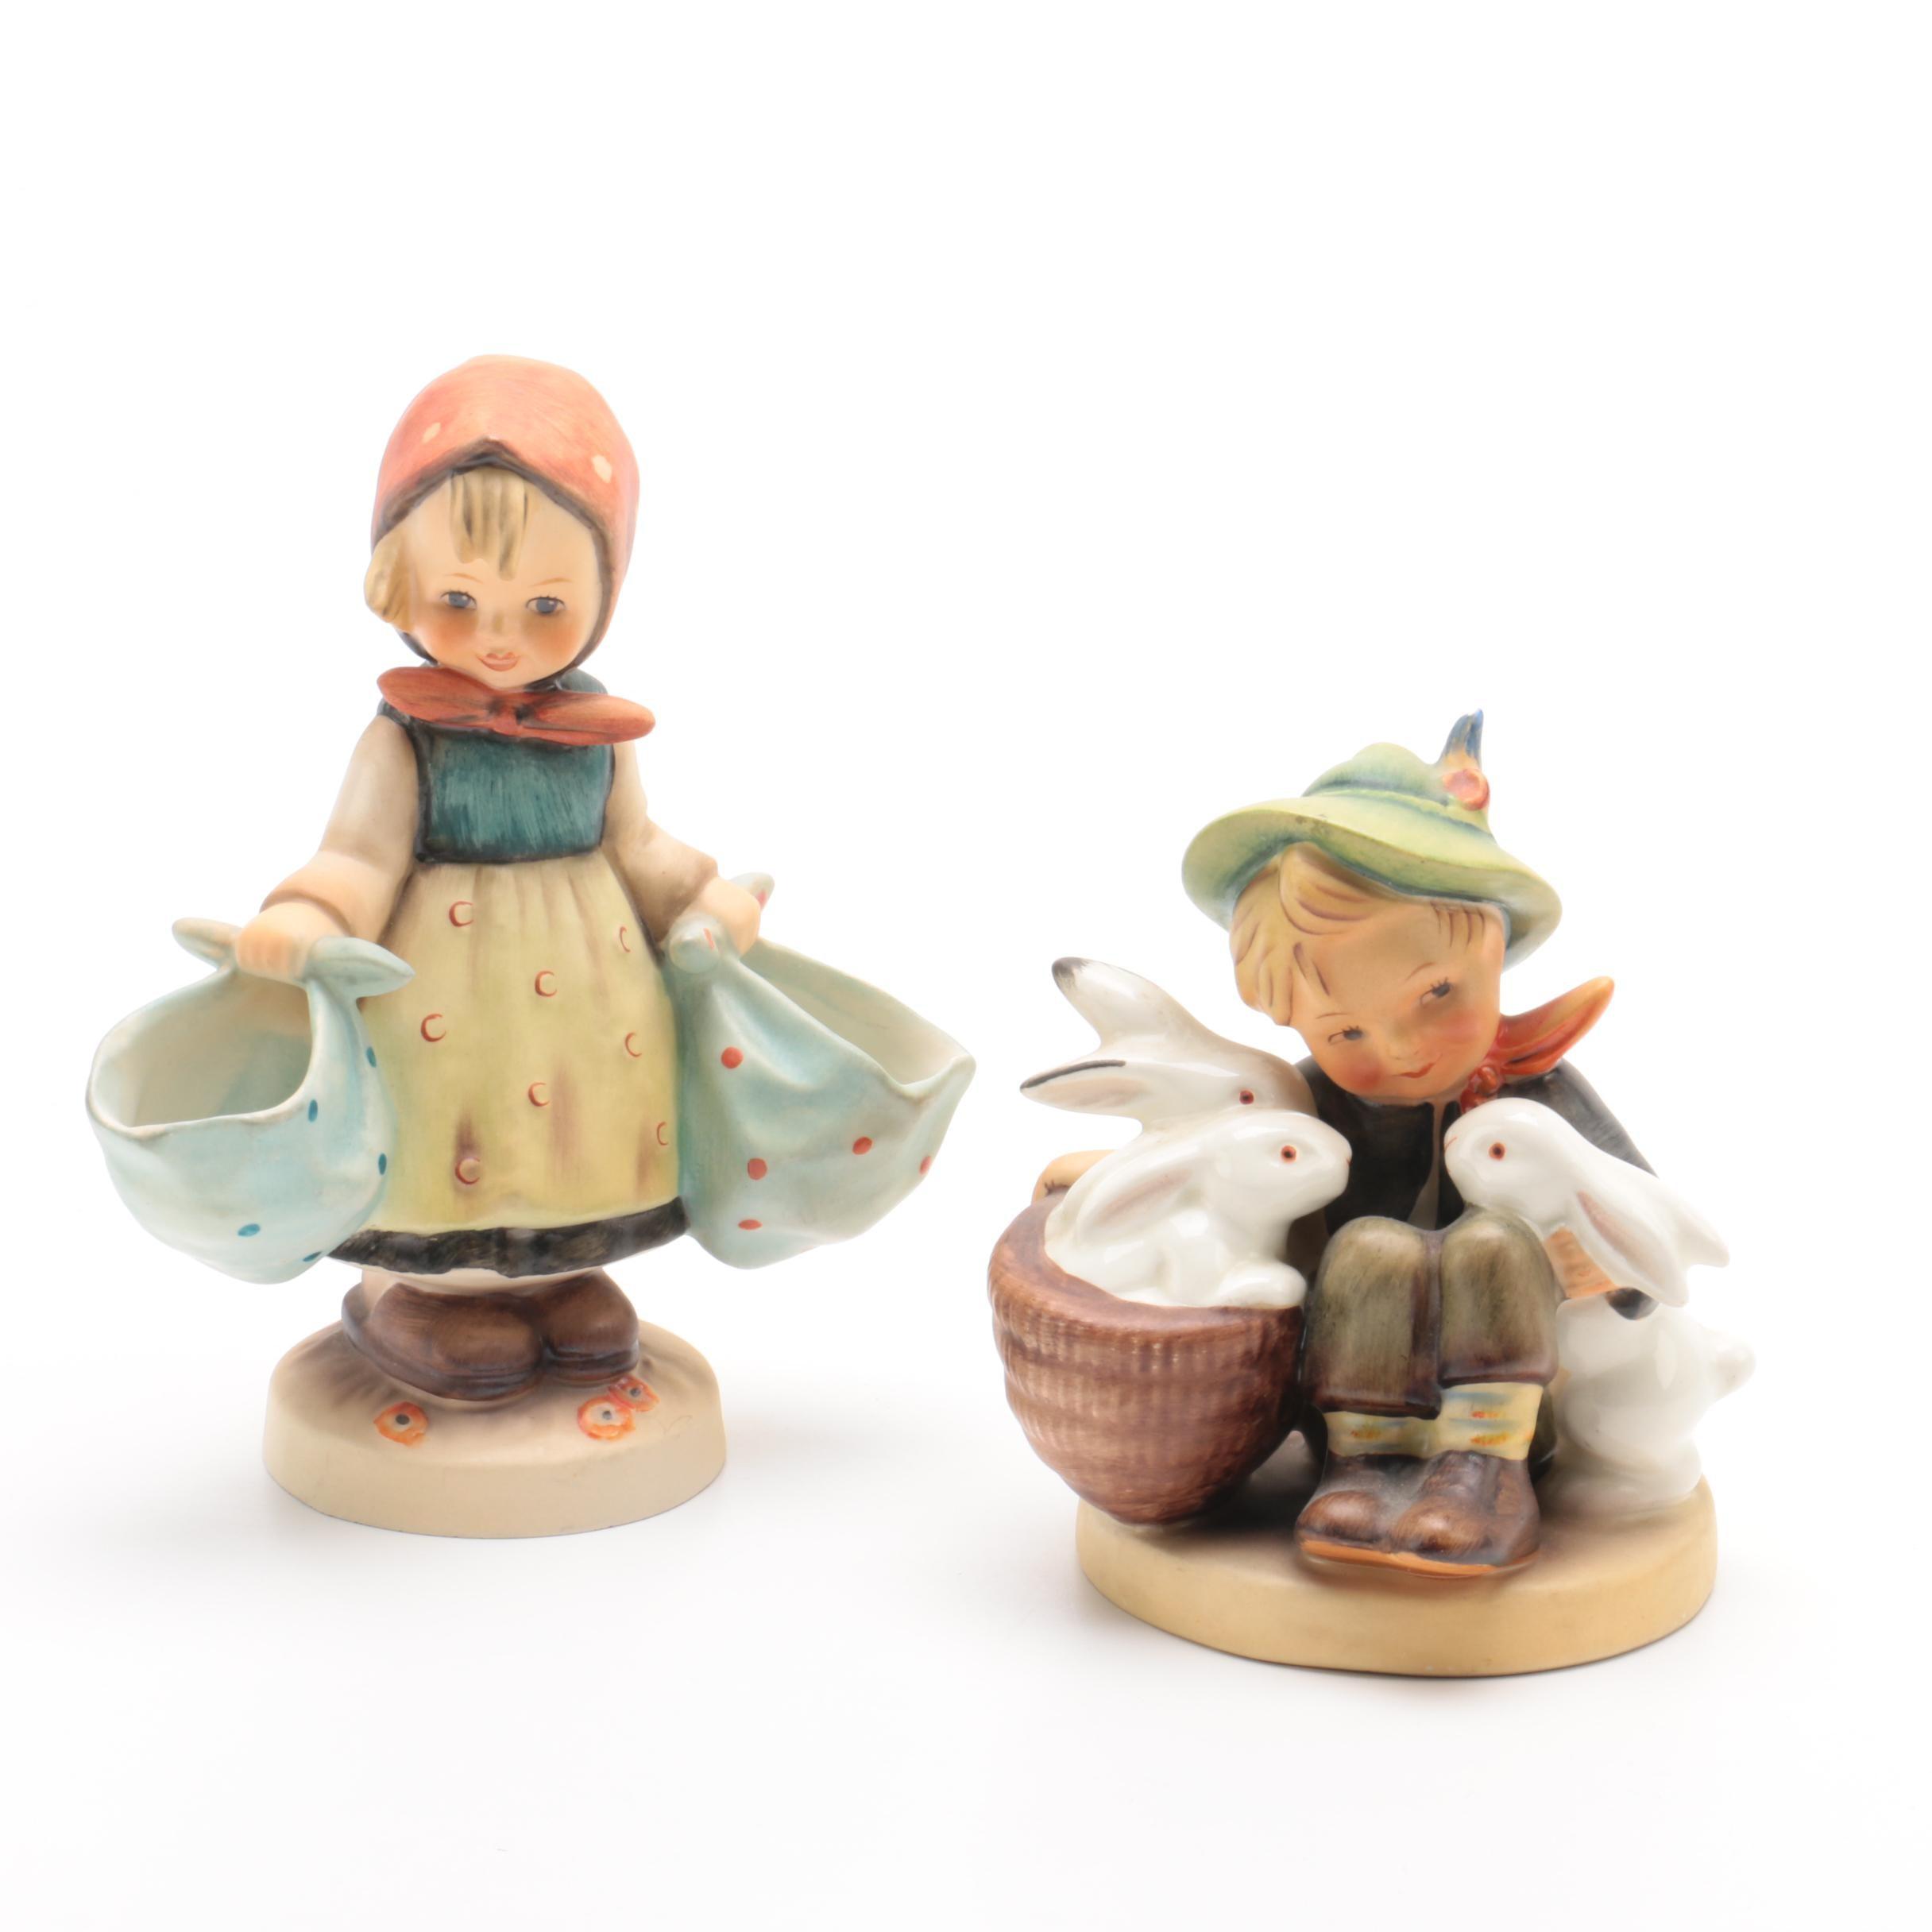 "Goebel Hummel TMK-2 ""Playmates"" and TMK-3 ""Mother's Darling"" Figurines"